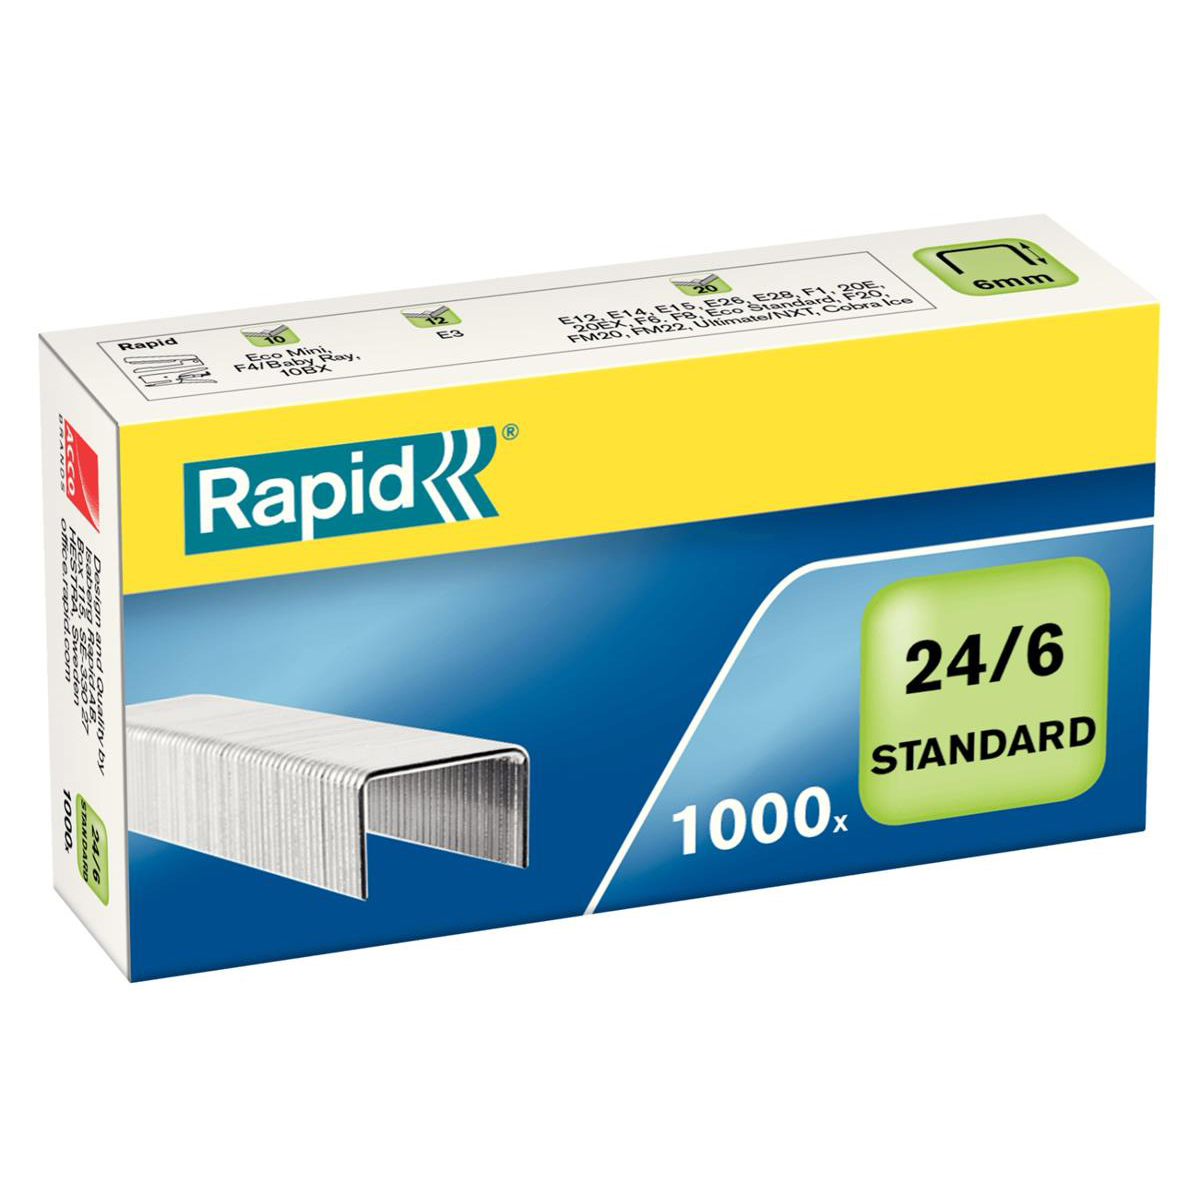 Rapid Staples 24/6mm Pack 1000 Ref 24855600